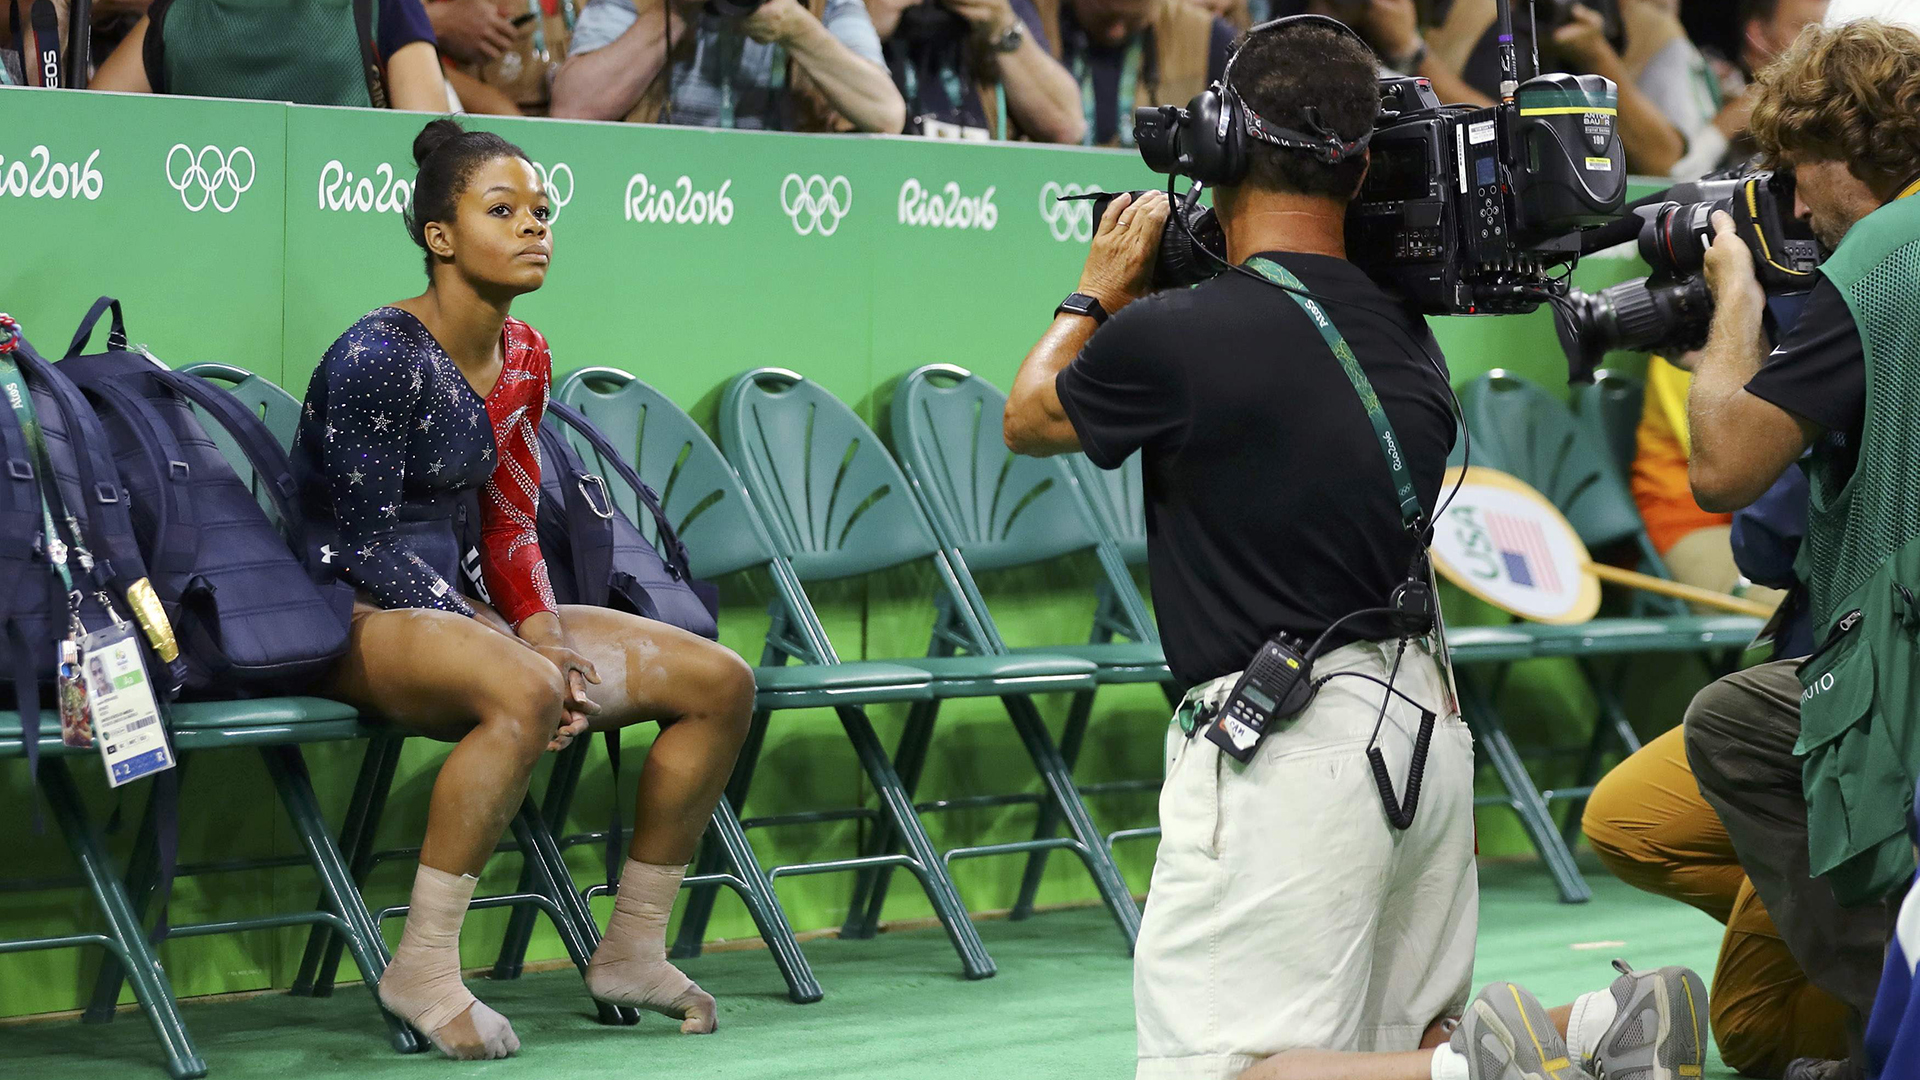 Gabby Douglas, her Olympics over, tearfully responds to social media critics